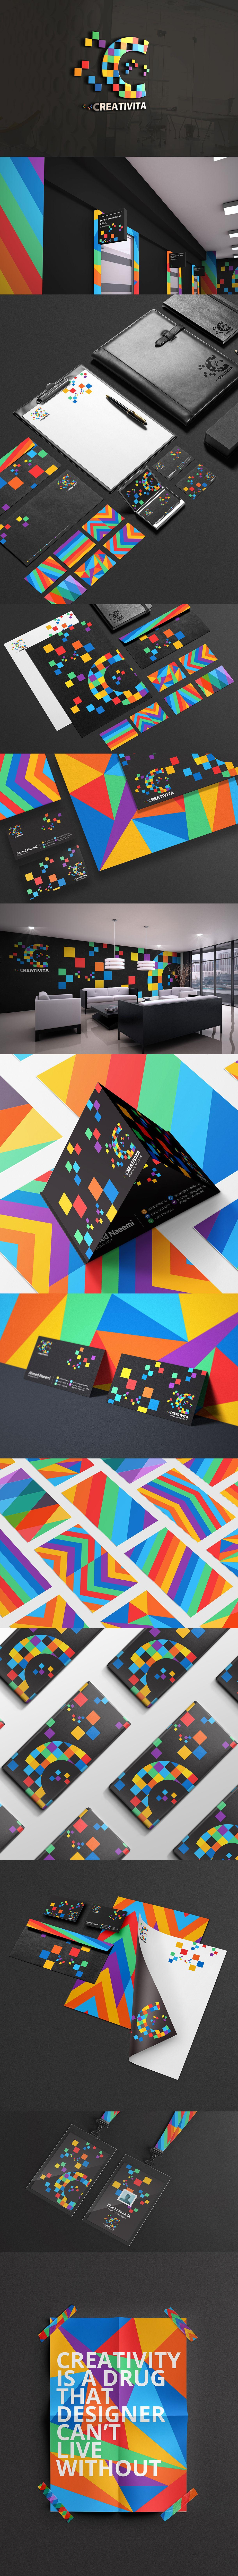 Creativita brand identity  Creativita is a design studio based in the Kingdom of Bahrain. This brand identity was created based on the combination of pixels and mutiple colors.  DOWNLOAD http://www.lemongraphic.sg/2016/04/25/creativita-brand-identity/ https://www.behance.net/gallery/36454473/Creativita-brand-identity  #pixel #creativita #business card #stationery #colorful #rainbow #happy #brand #brand design #colours #creativity #bahrain